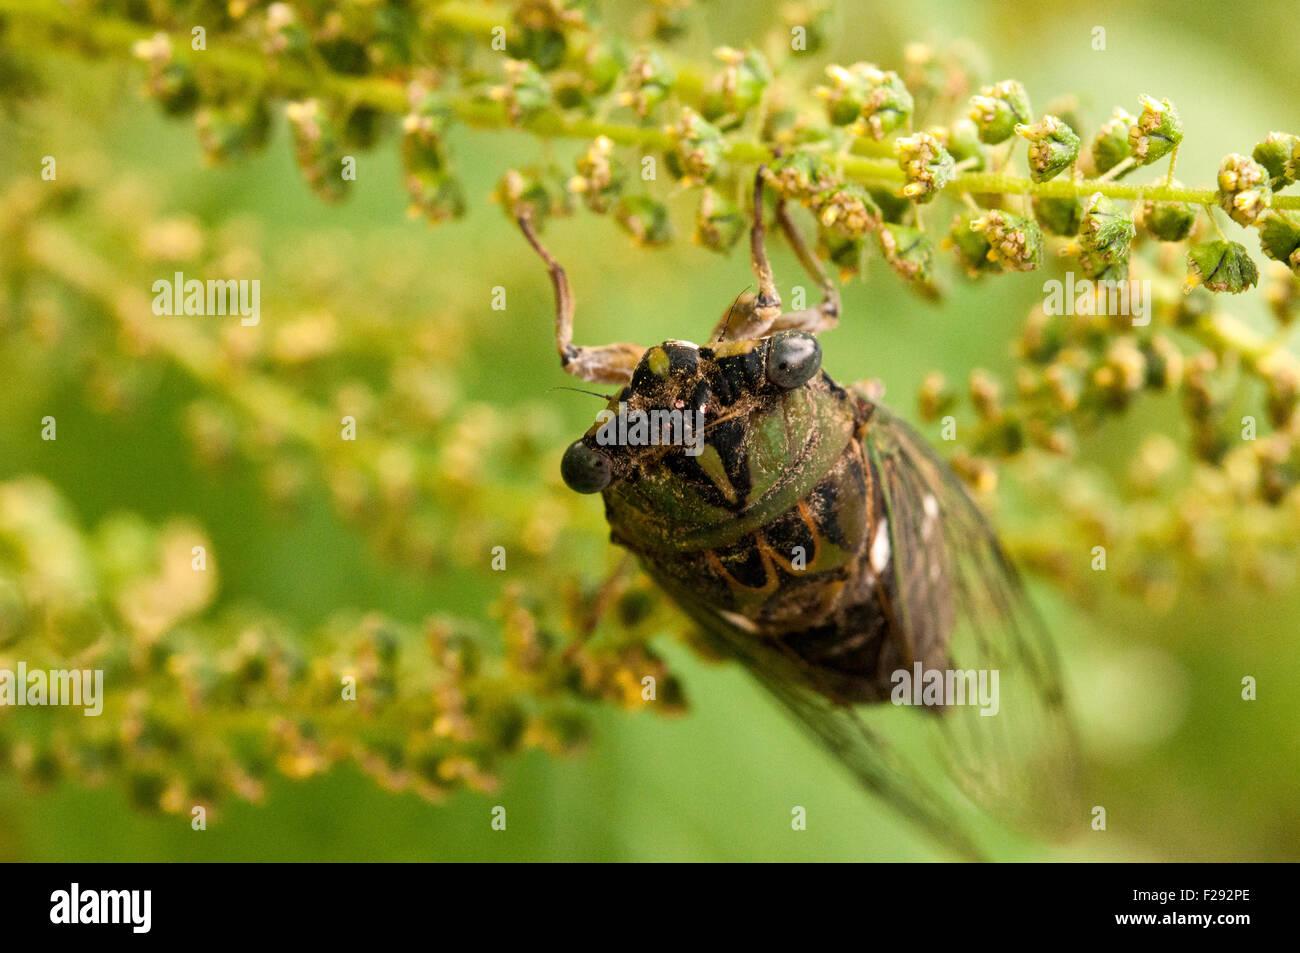 Cicada - Stock Image